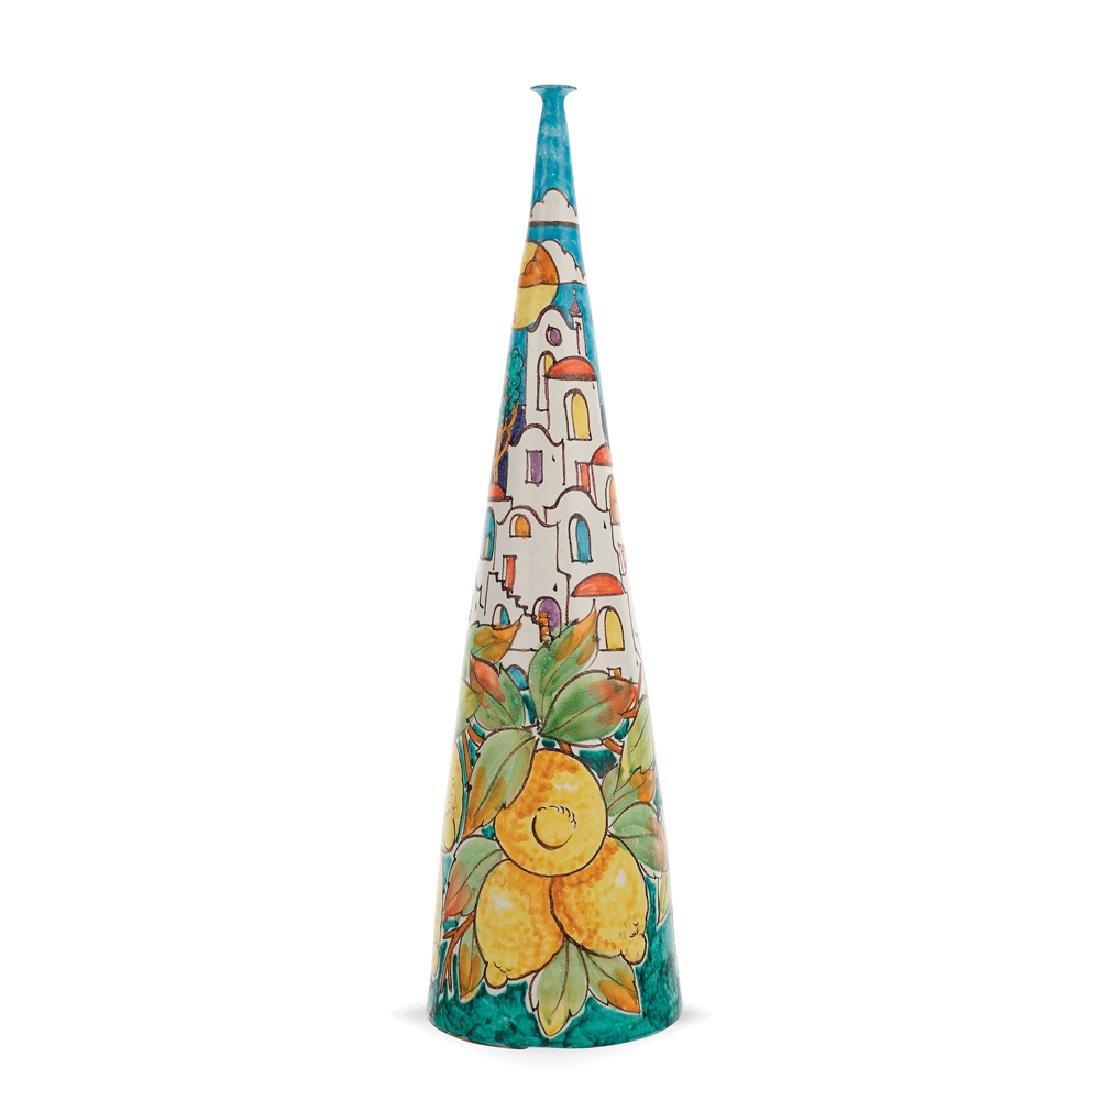 Glazed ceramic vase Vietri 20th century h. 39 cm.